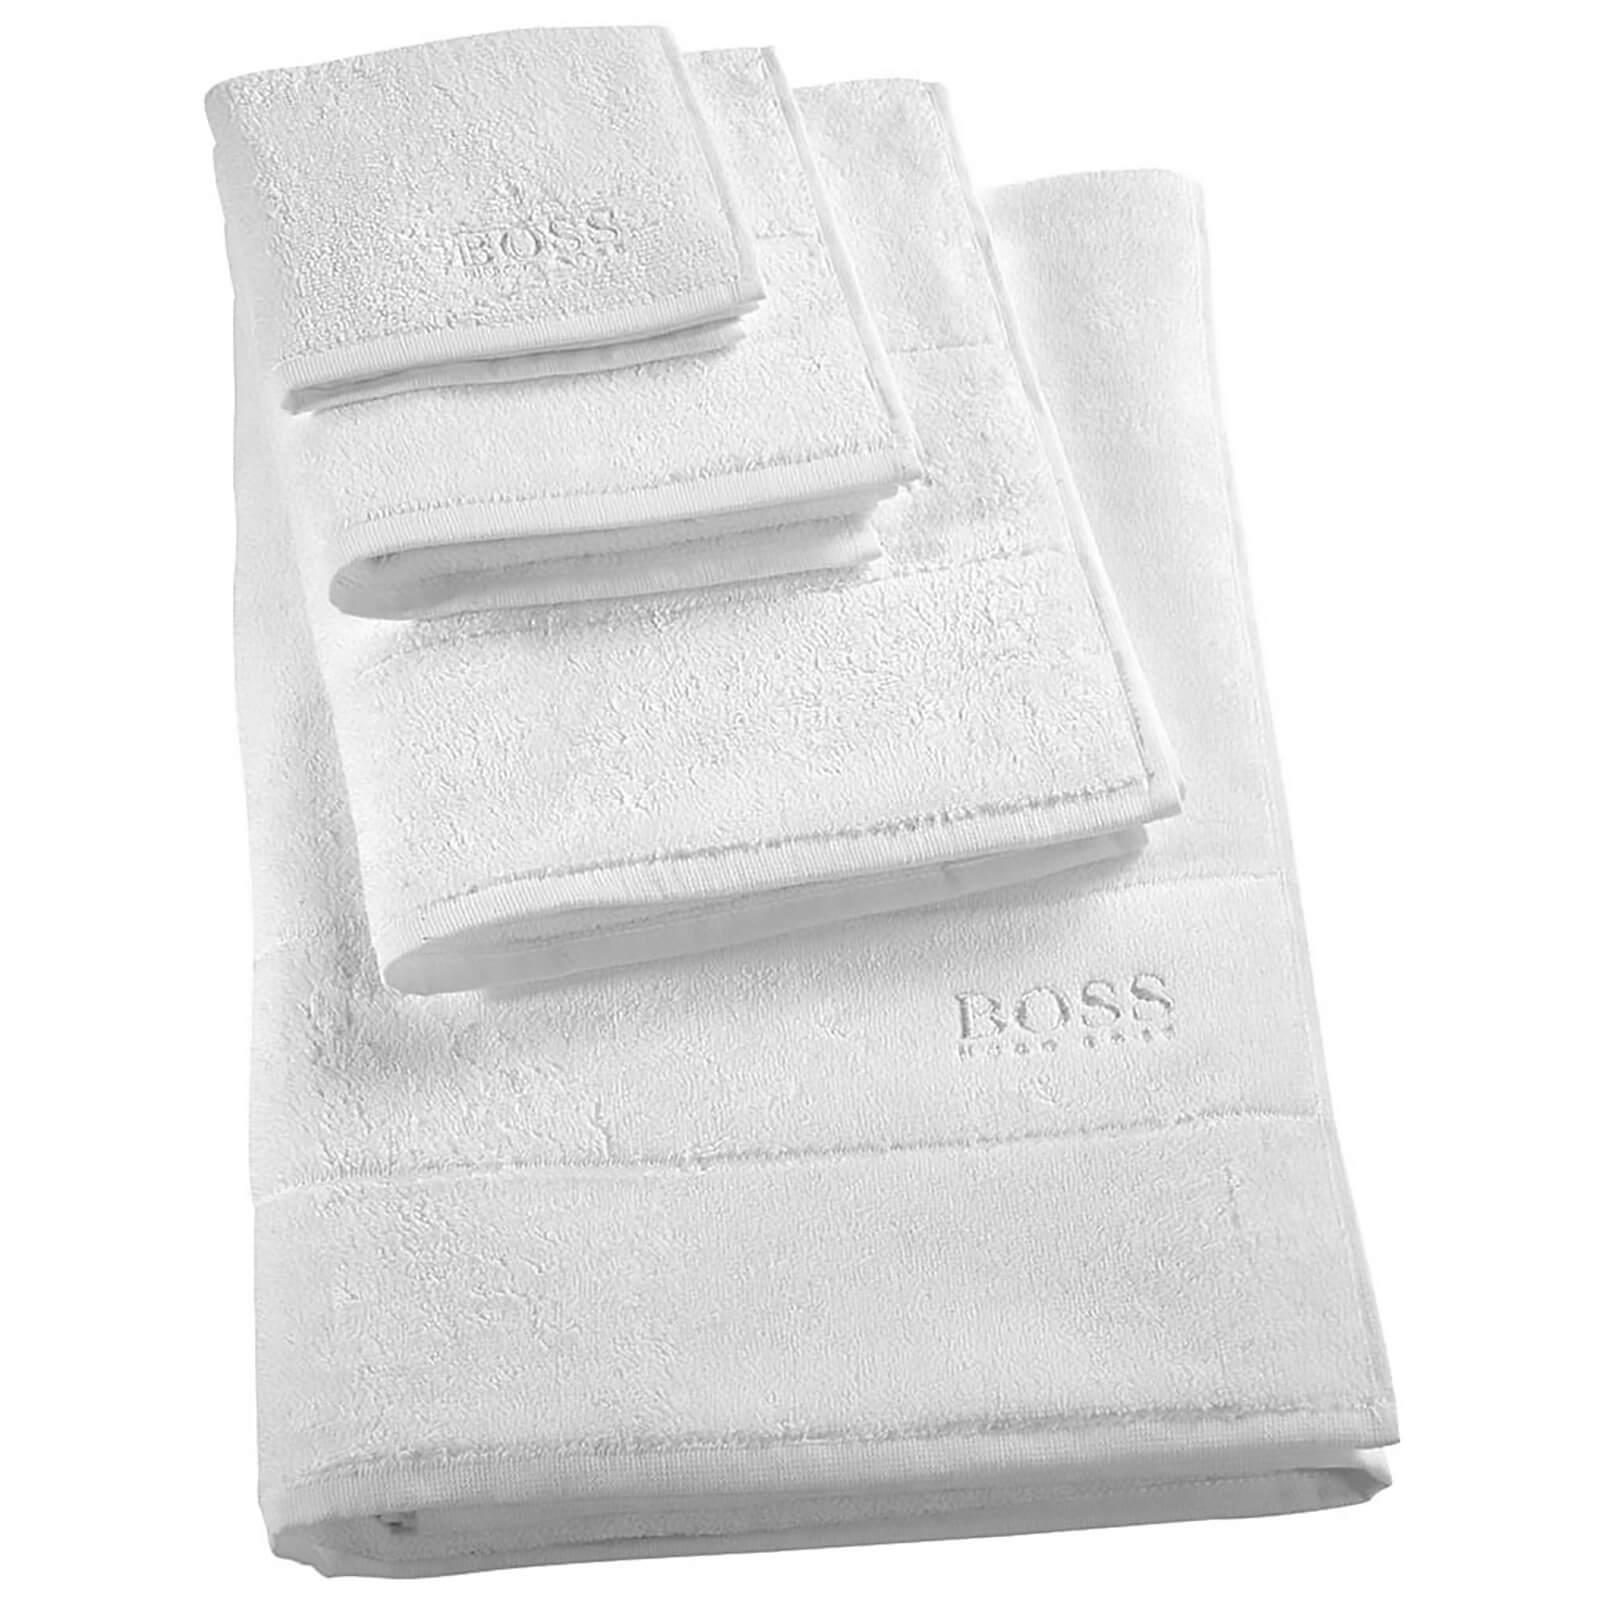 Hugo Boss Plain Towels - Ice - Face Cloth - White